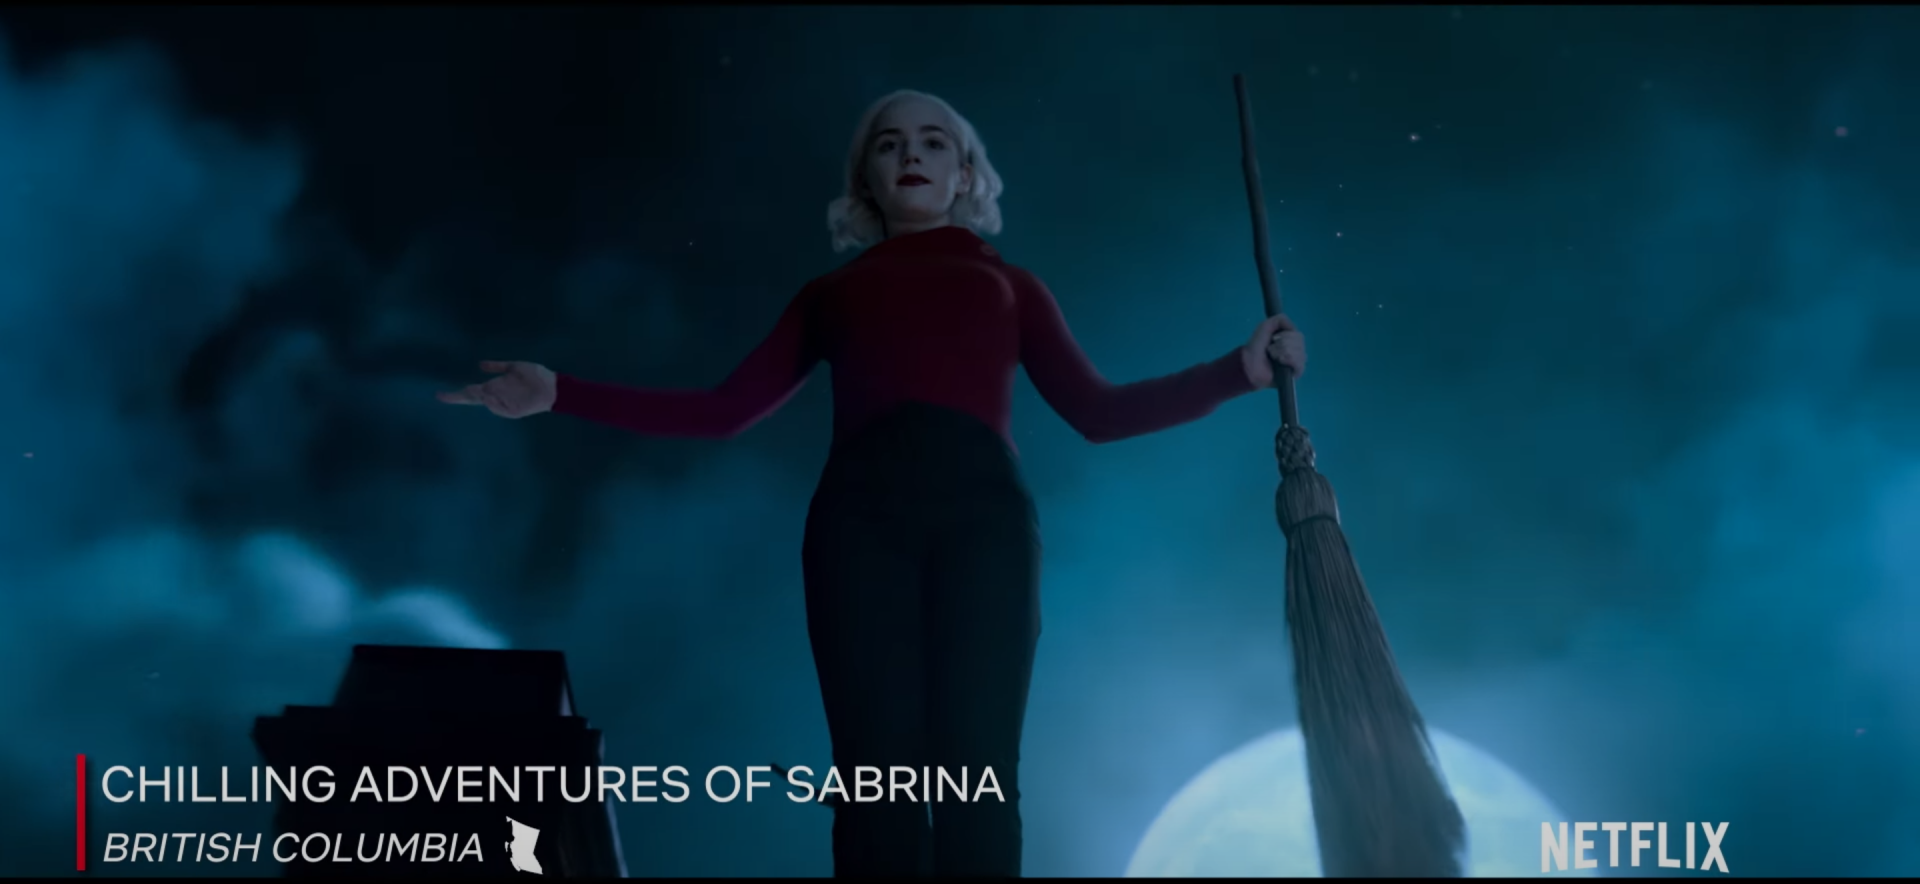 adventures of sabrina